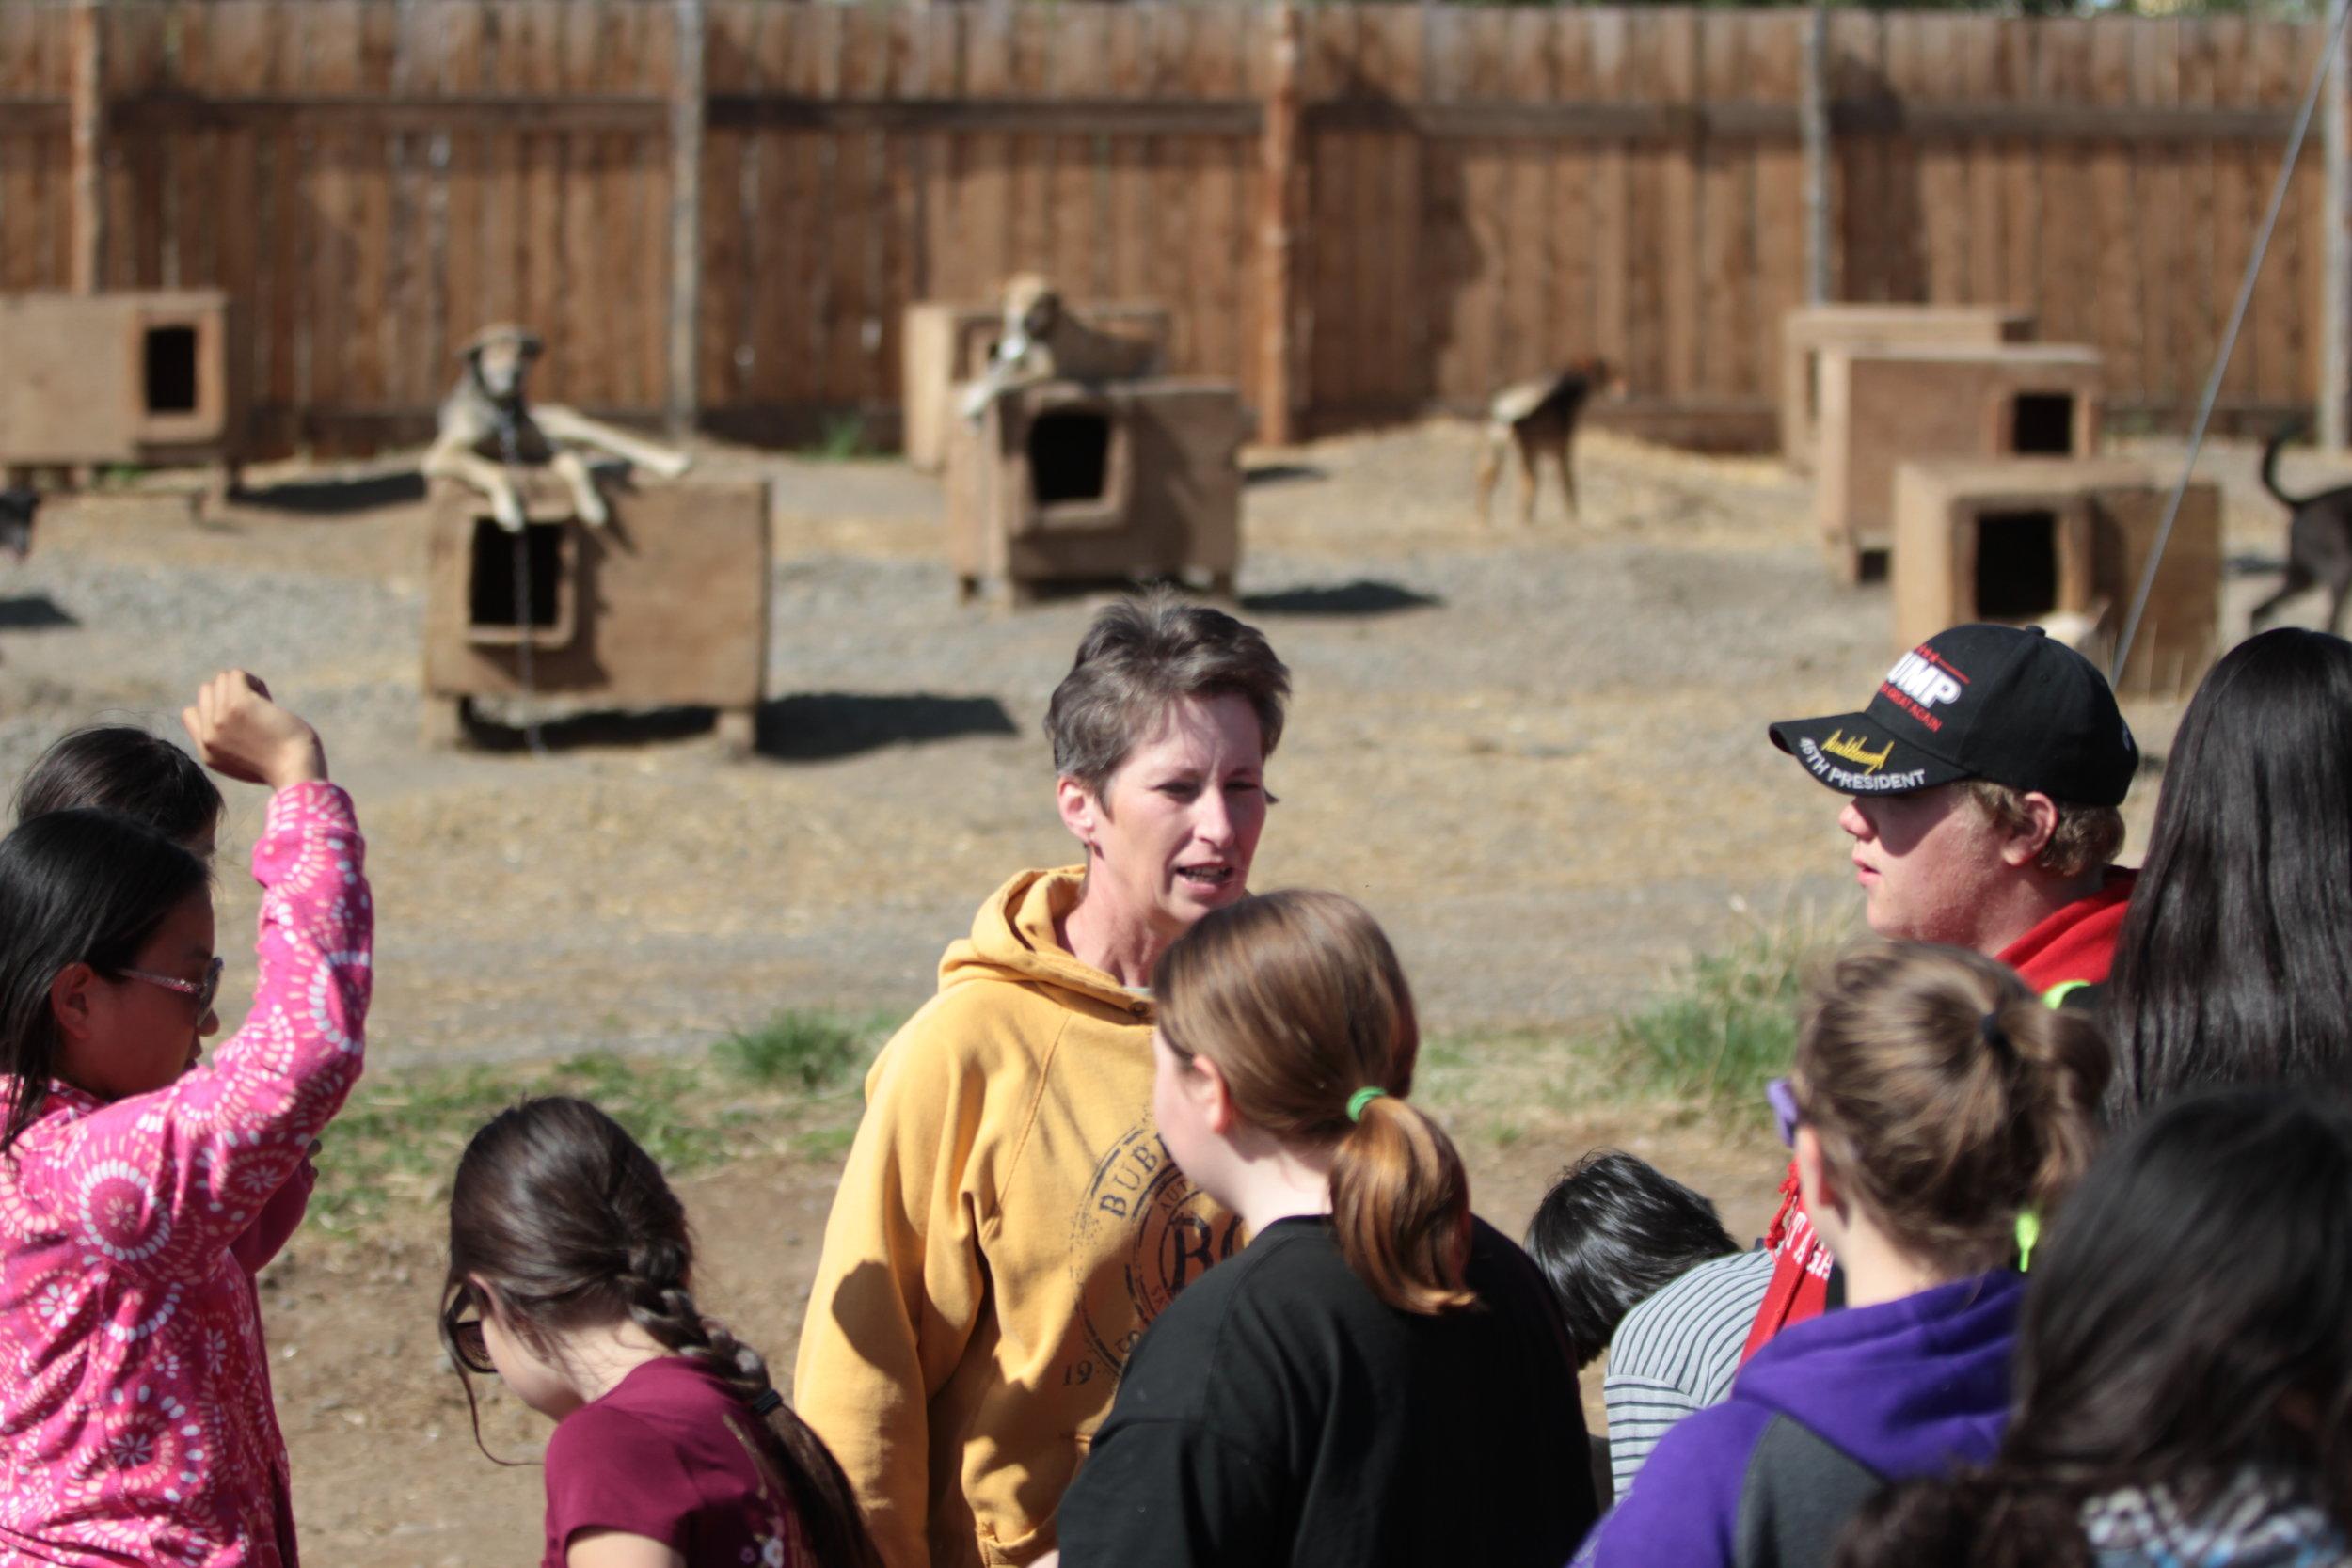 Eagle & Tanacross students in dog yard with Musher Teacher.